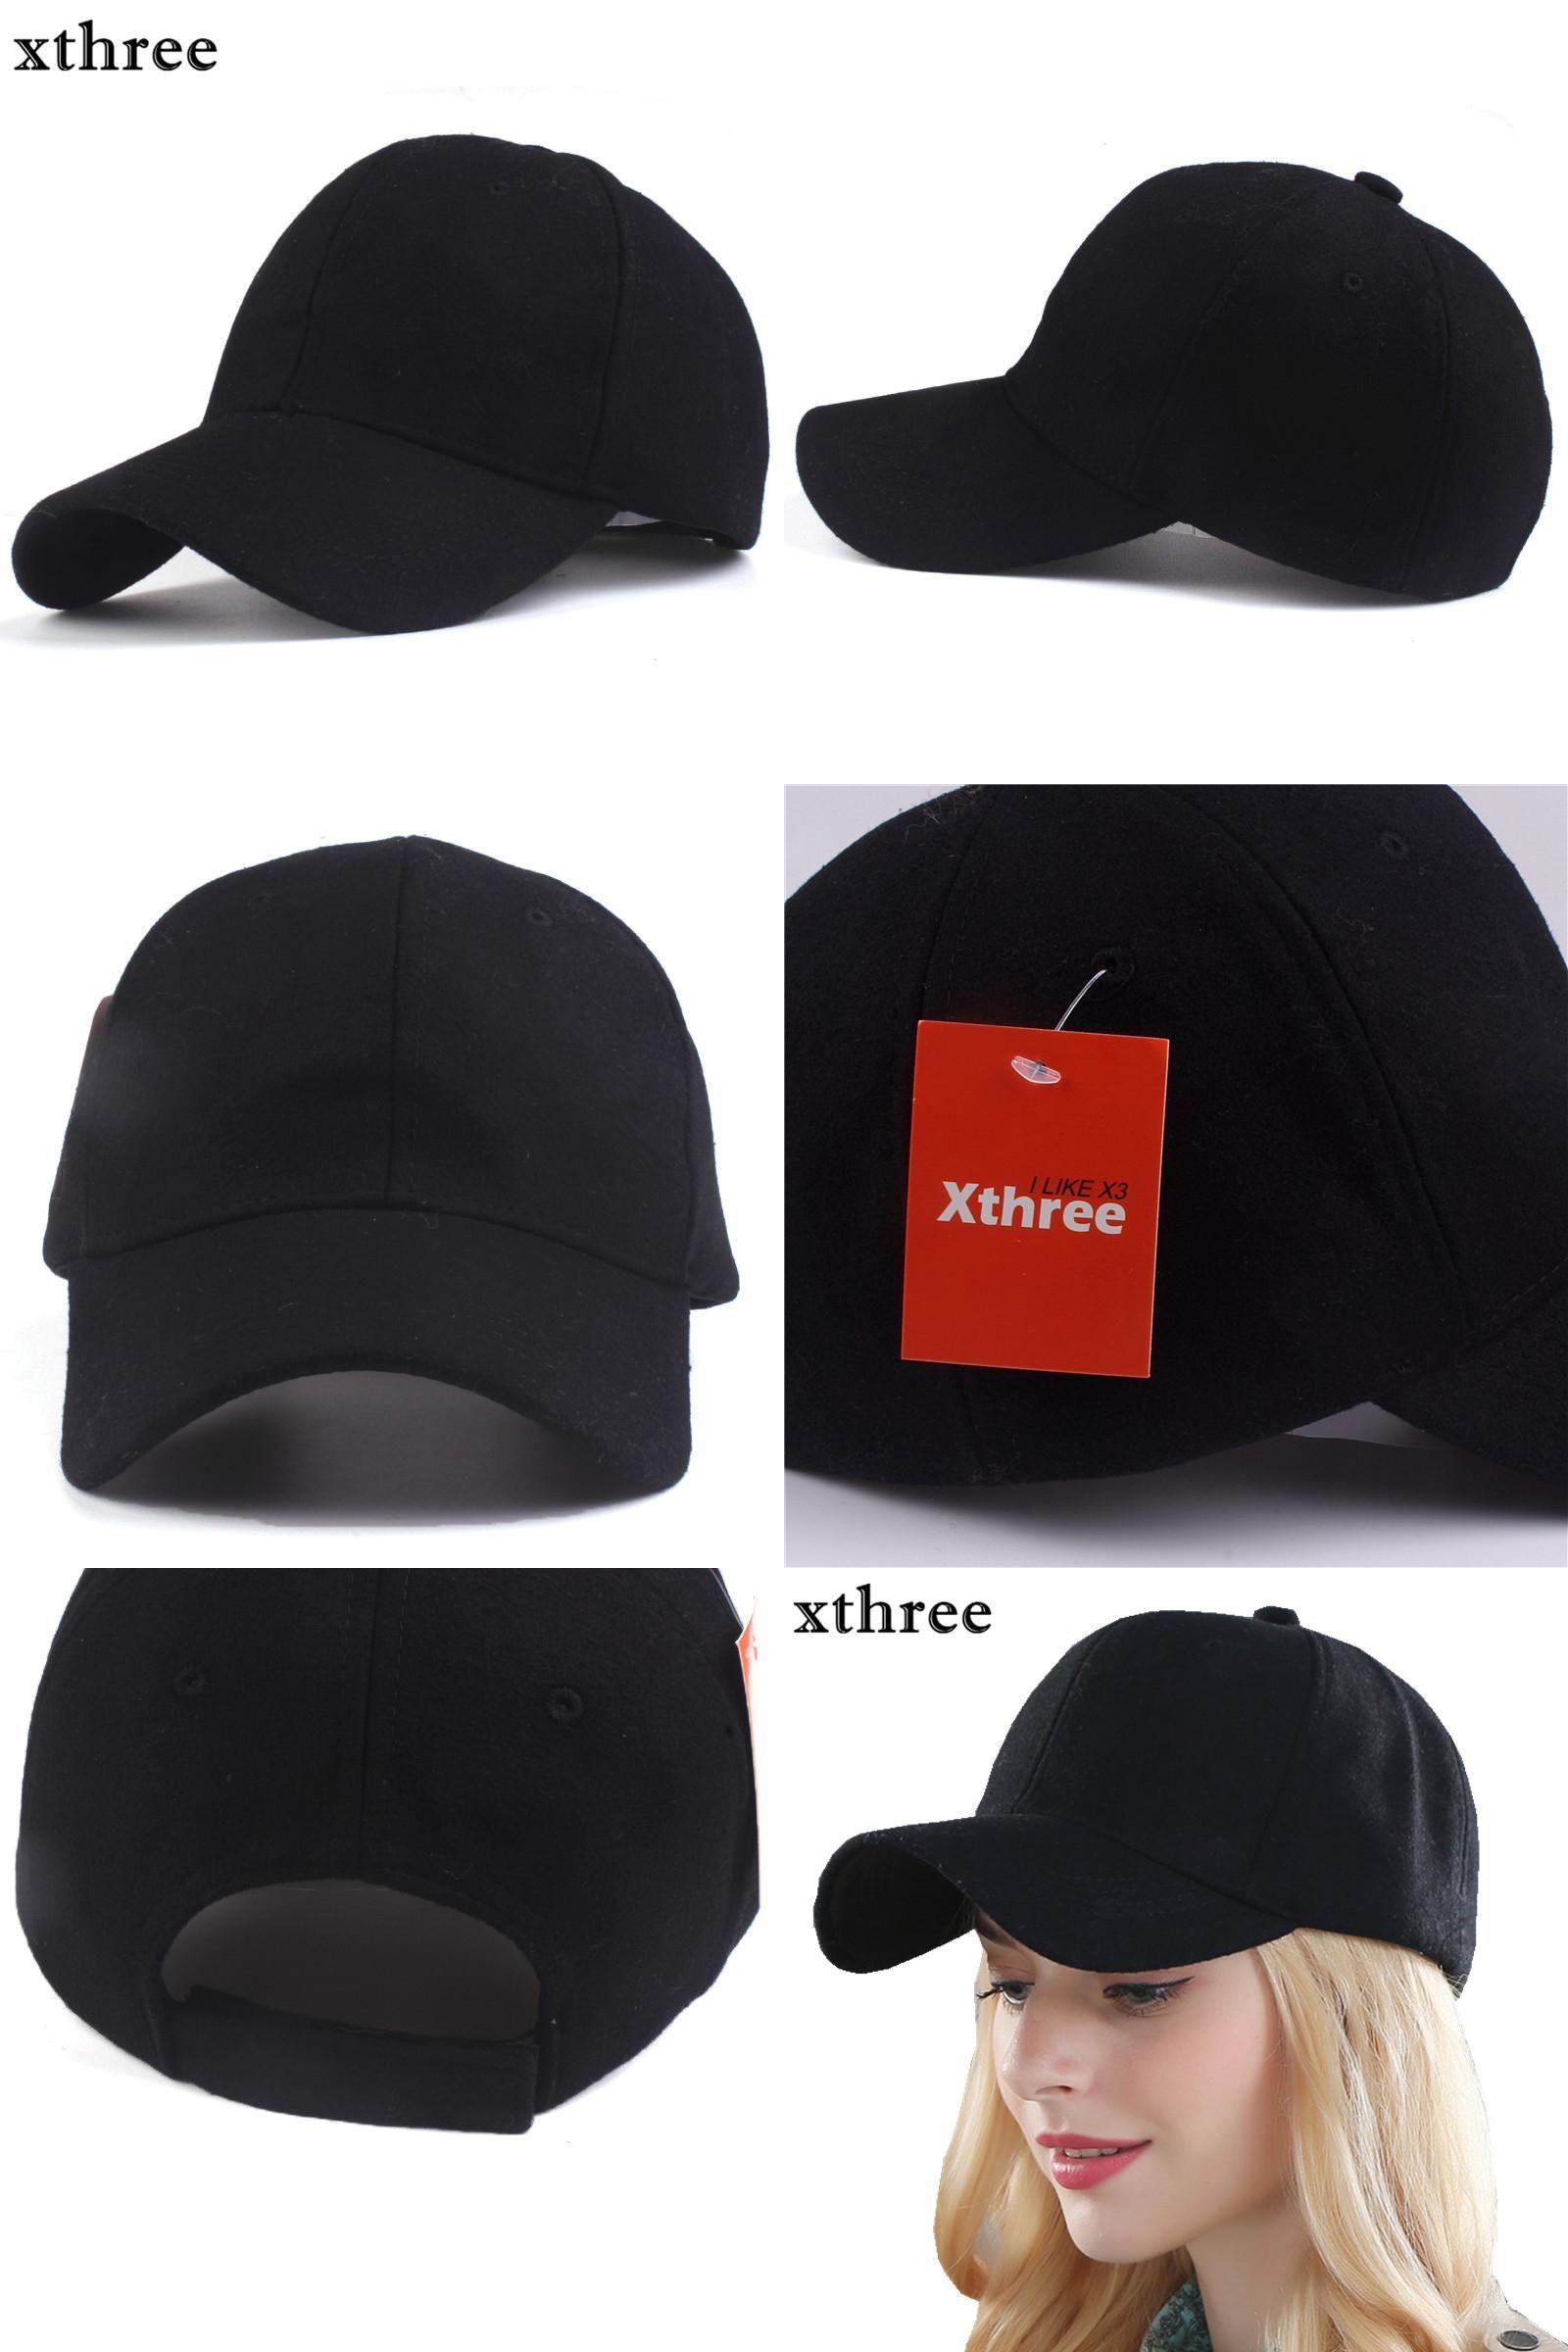 a4d8a3e796d  Visit to Buy  Xthree solid men s wool baseball cap winter cap warm bone  snapback